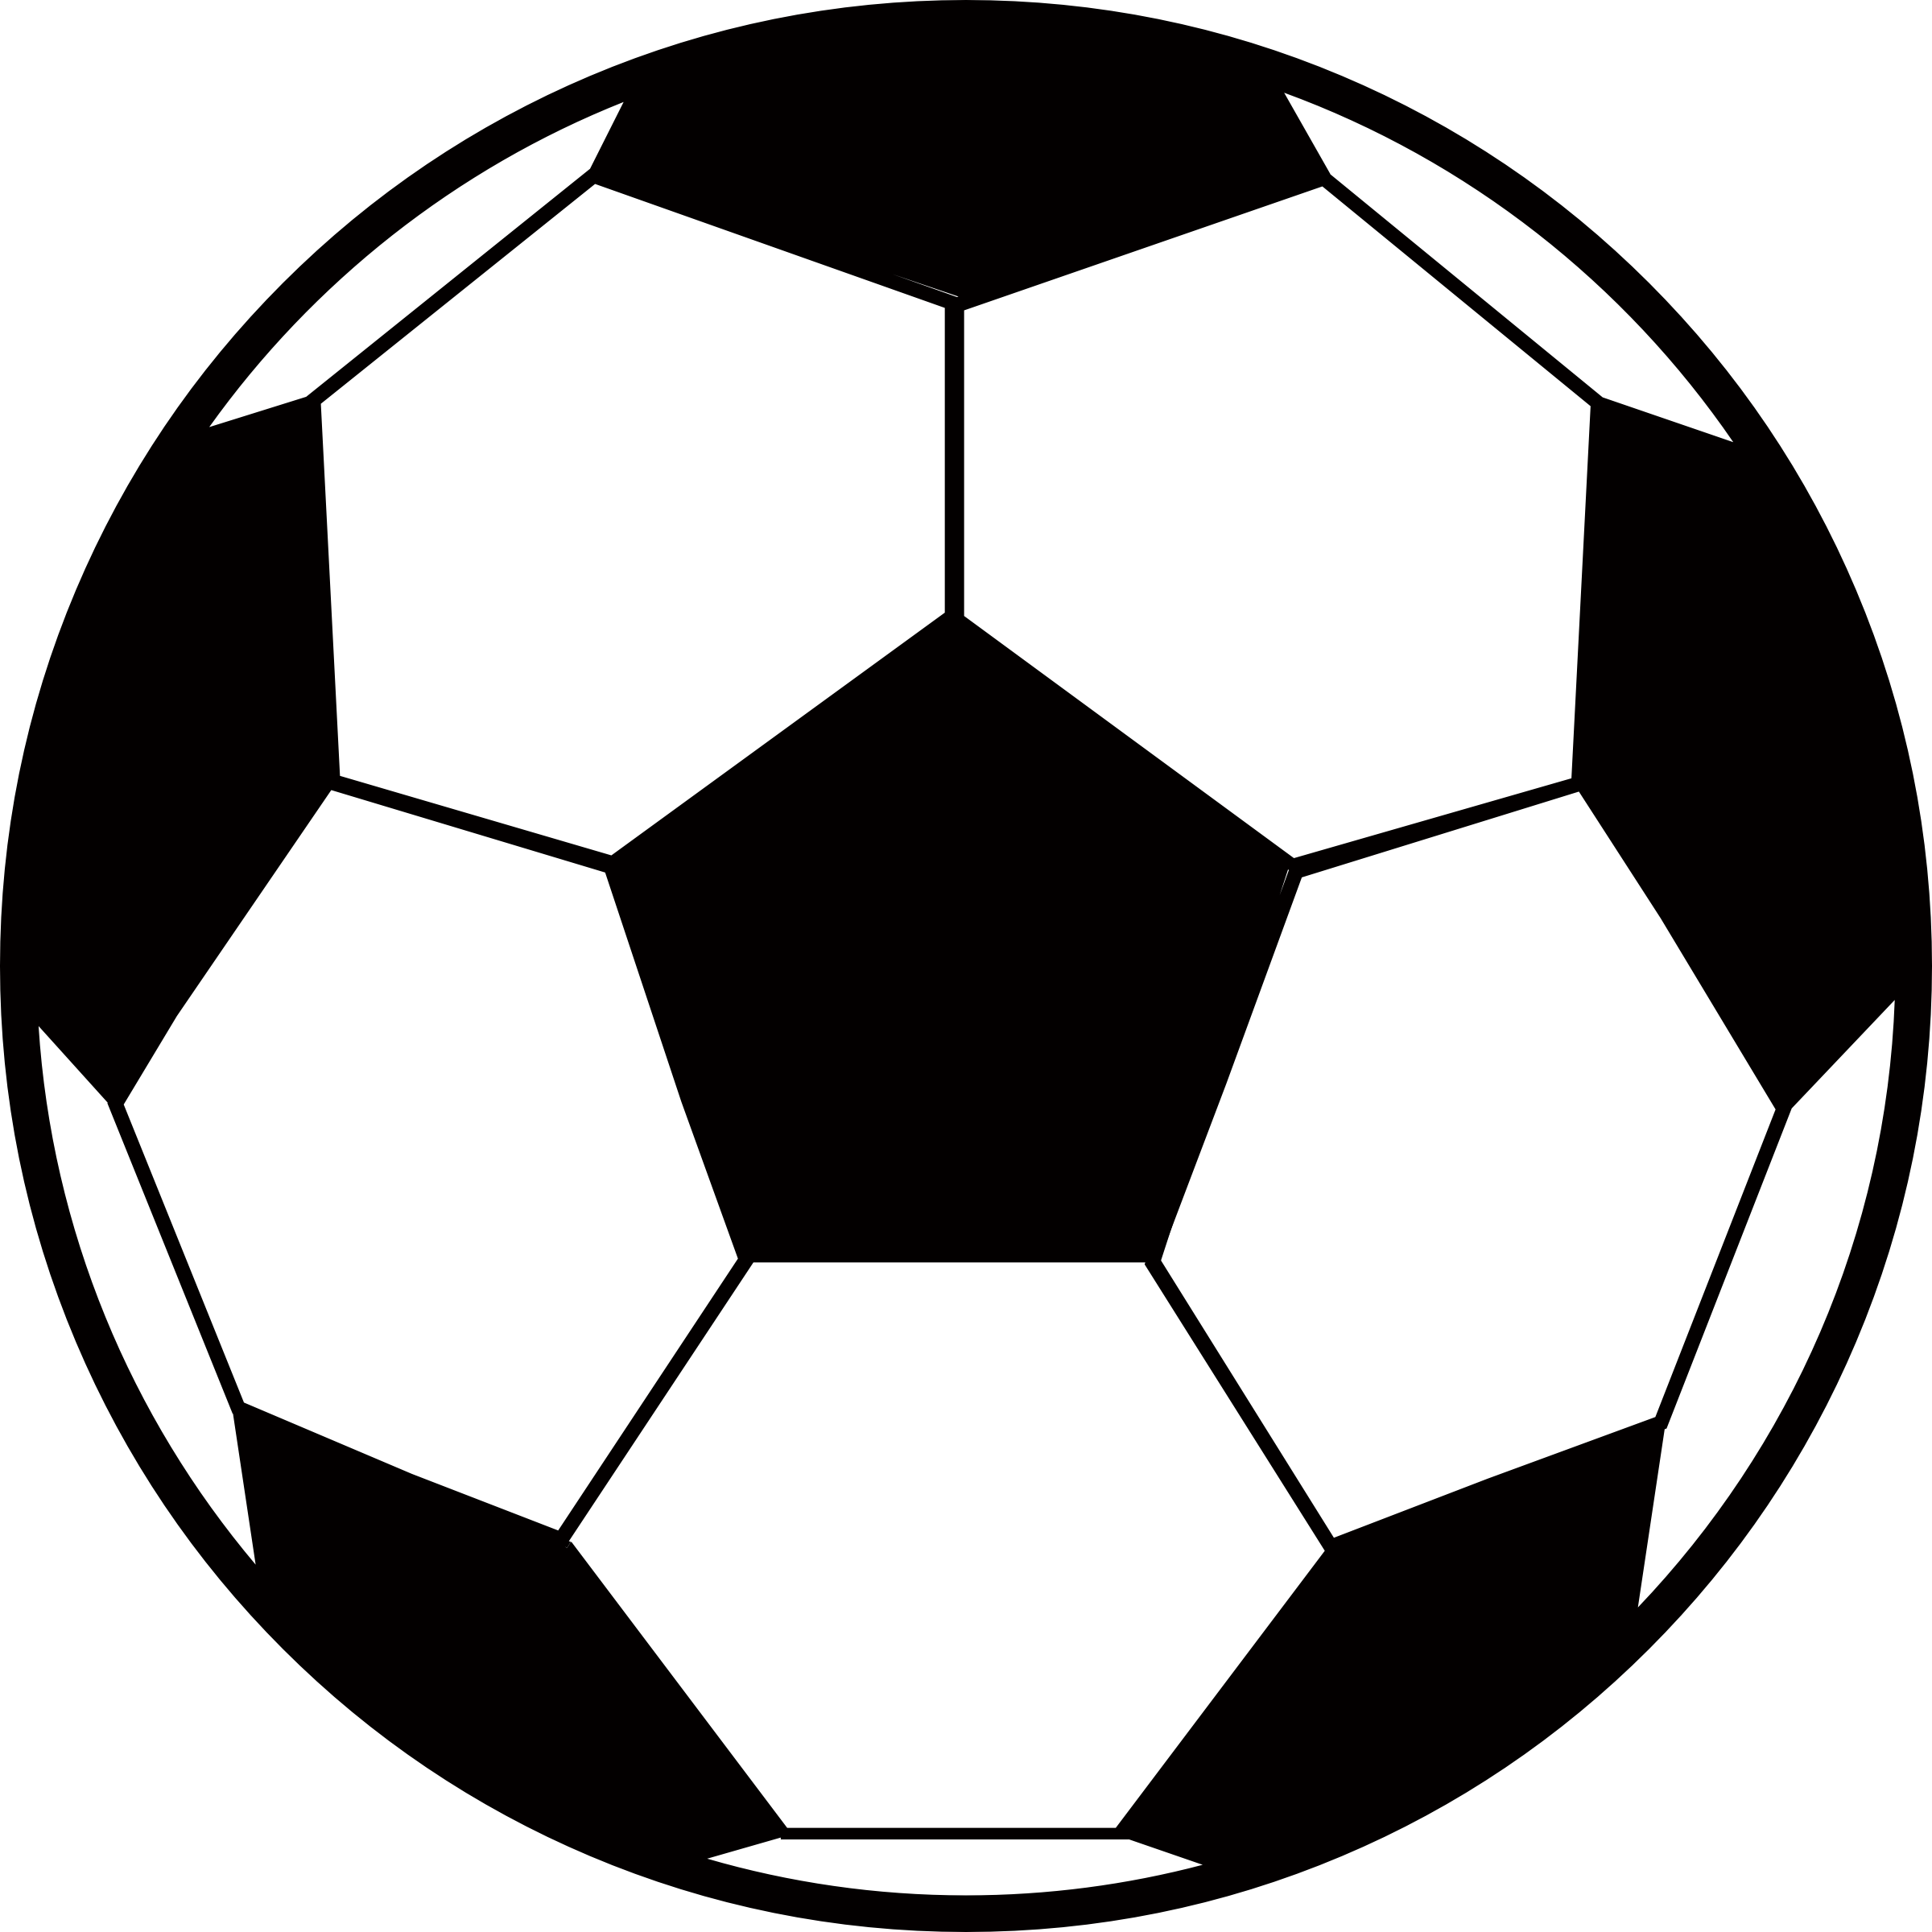 clipart soccer ball 2 rh openclipart org soccer ball clip art images soccer ball clip art transparent background